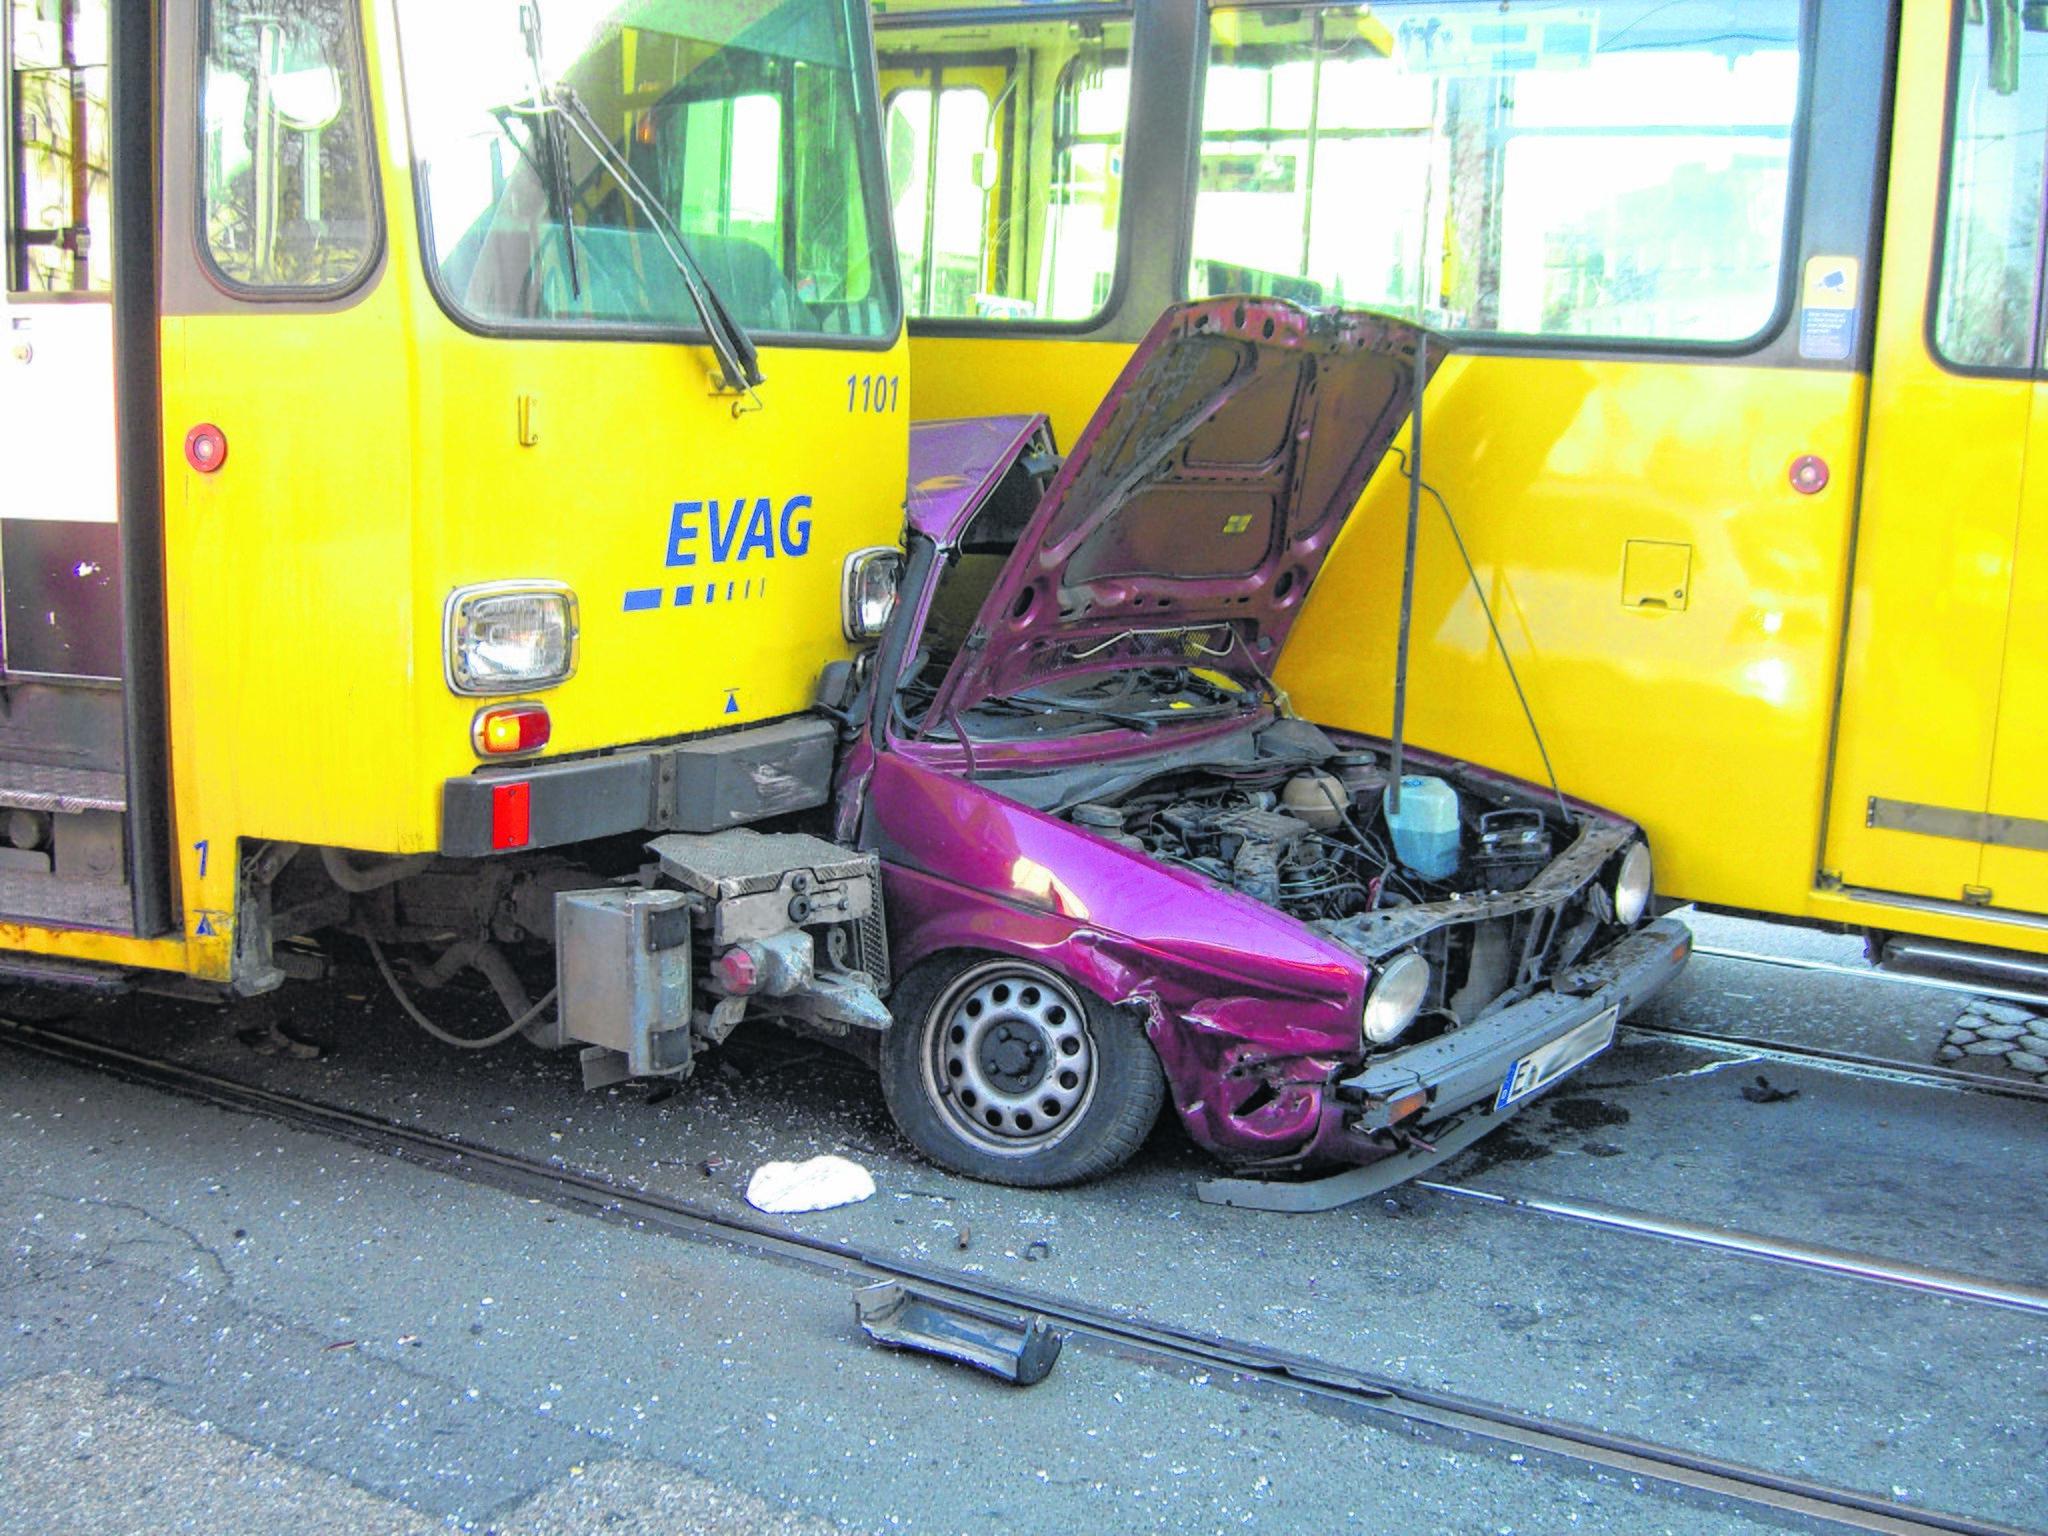 Straßenbahnunfall Köln Heute